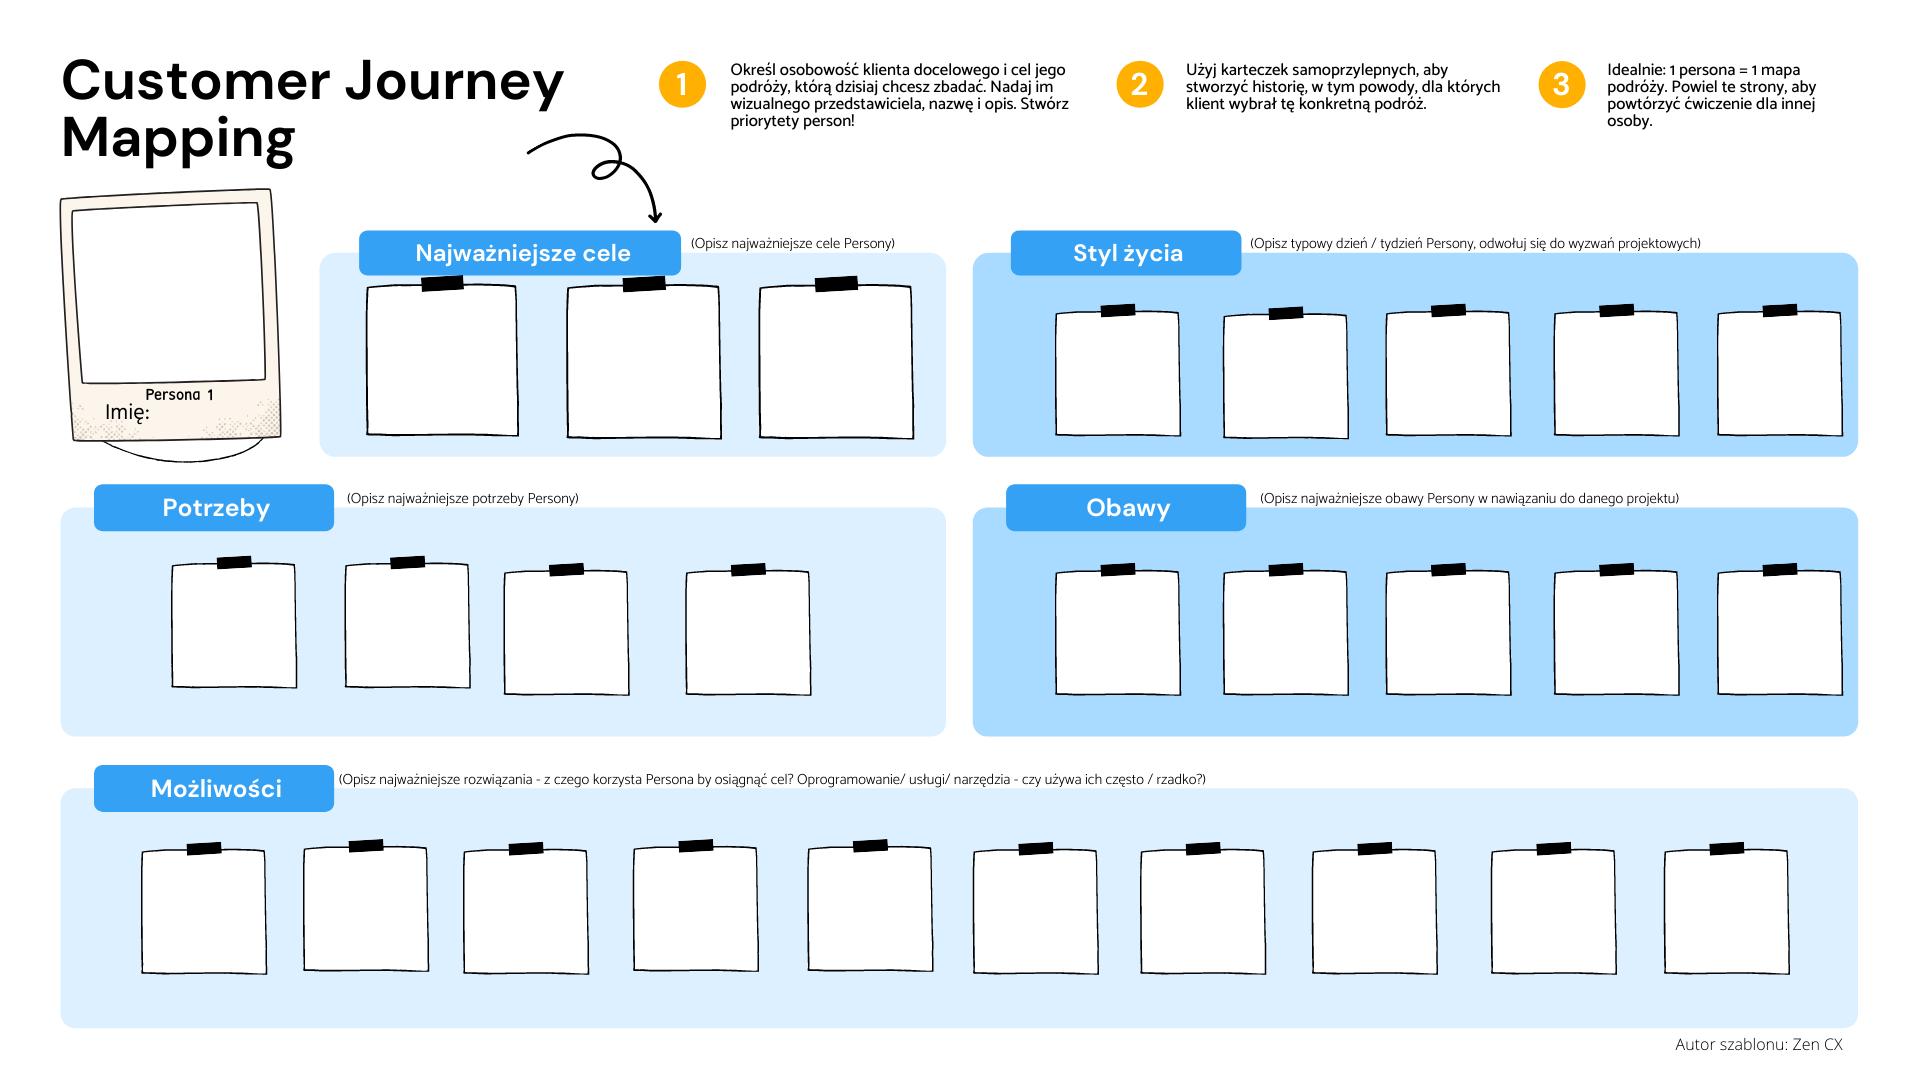 portfolio/067/078267/Customer_Journey_Mapping_Zen_CX_nXKXa8E.png